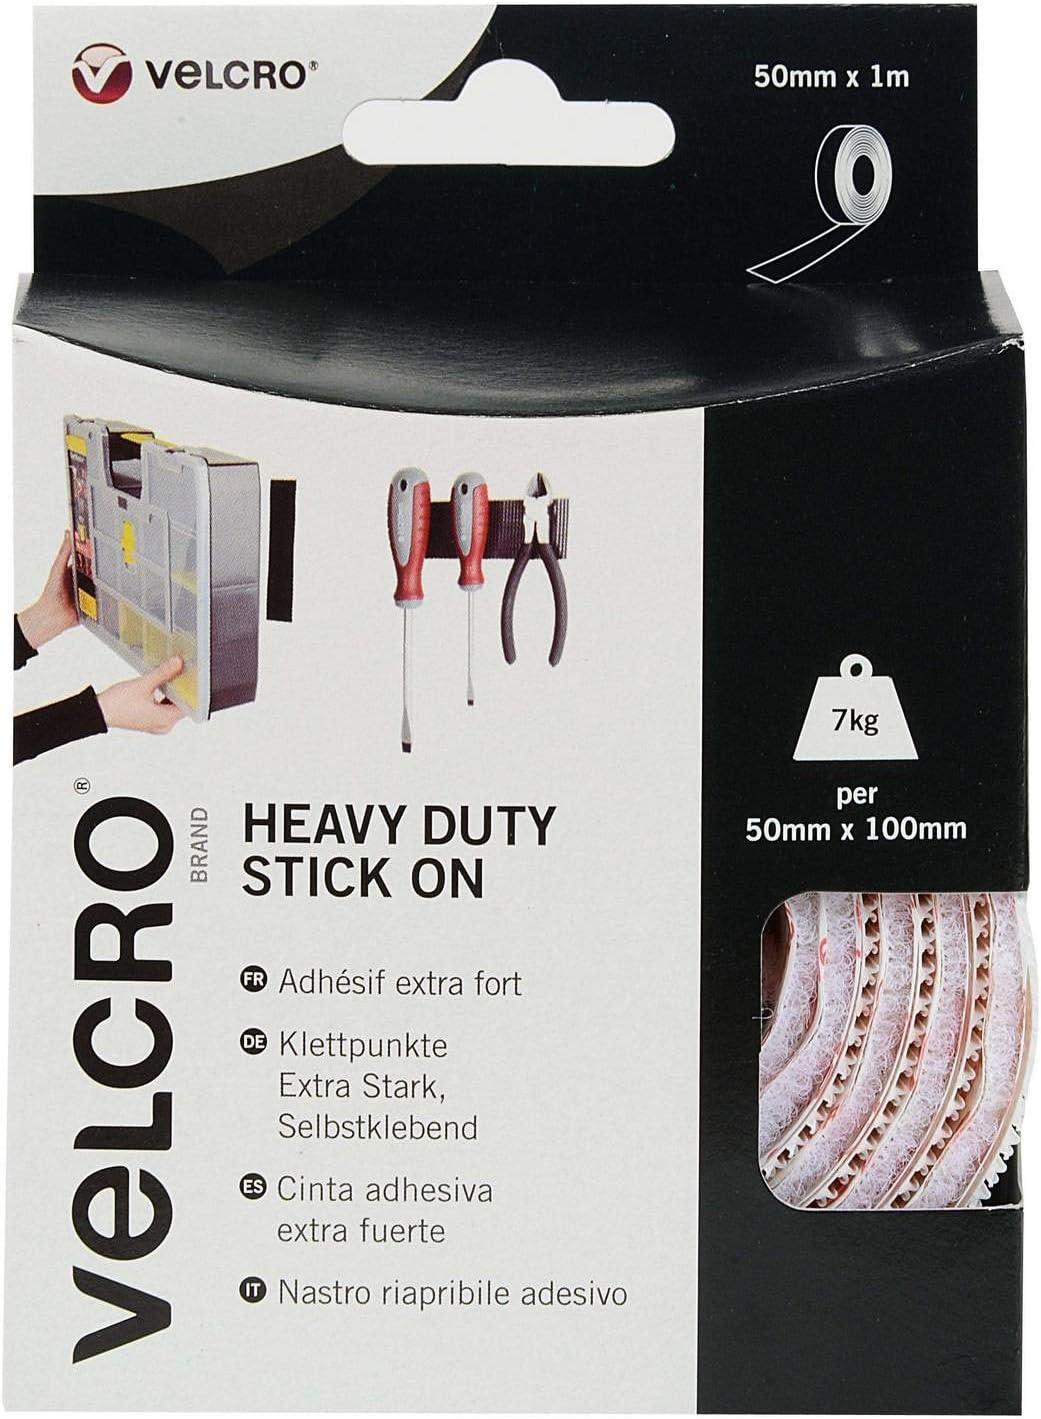 2 x VELCRO Brand Heavy Duty Stick On Self Adhesive Strips 4 x 50mm x 100mm